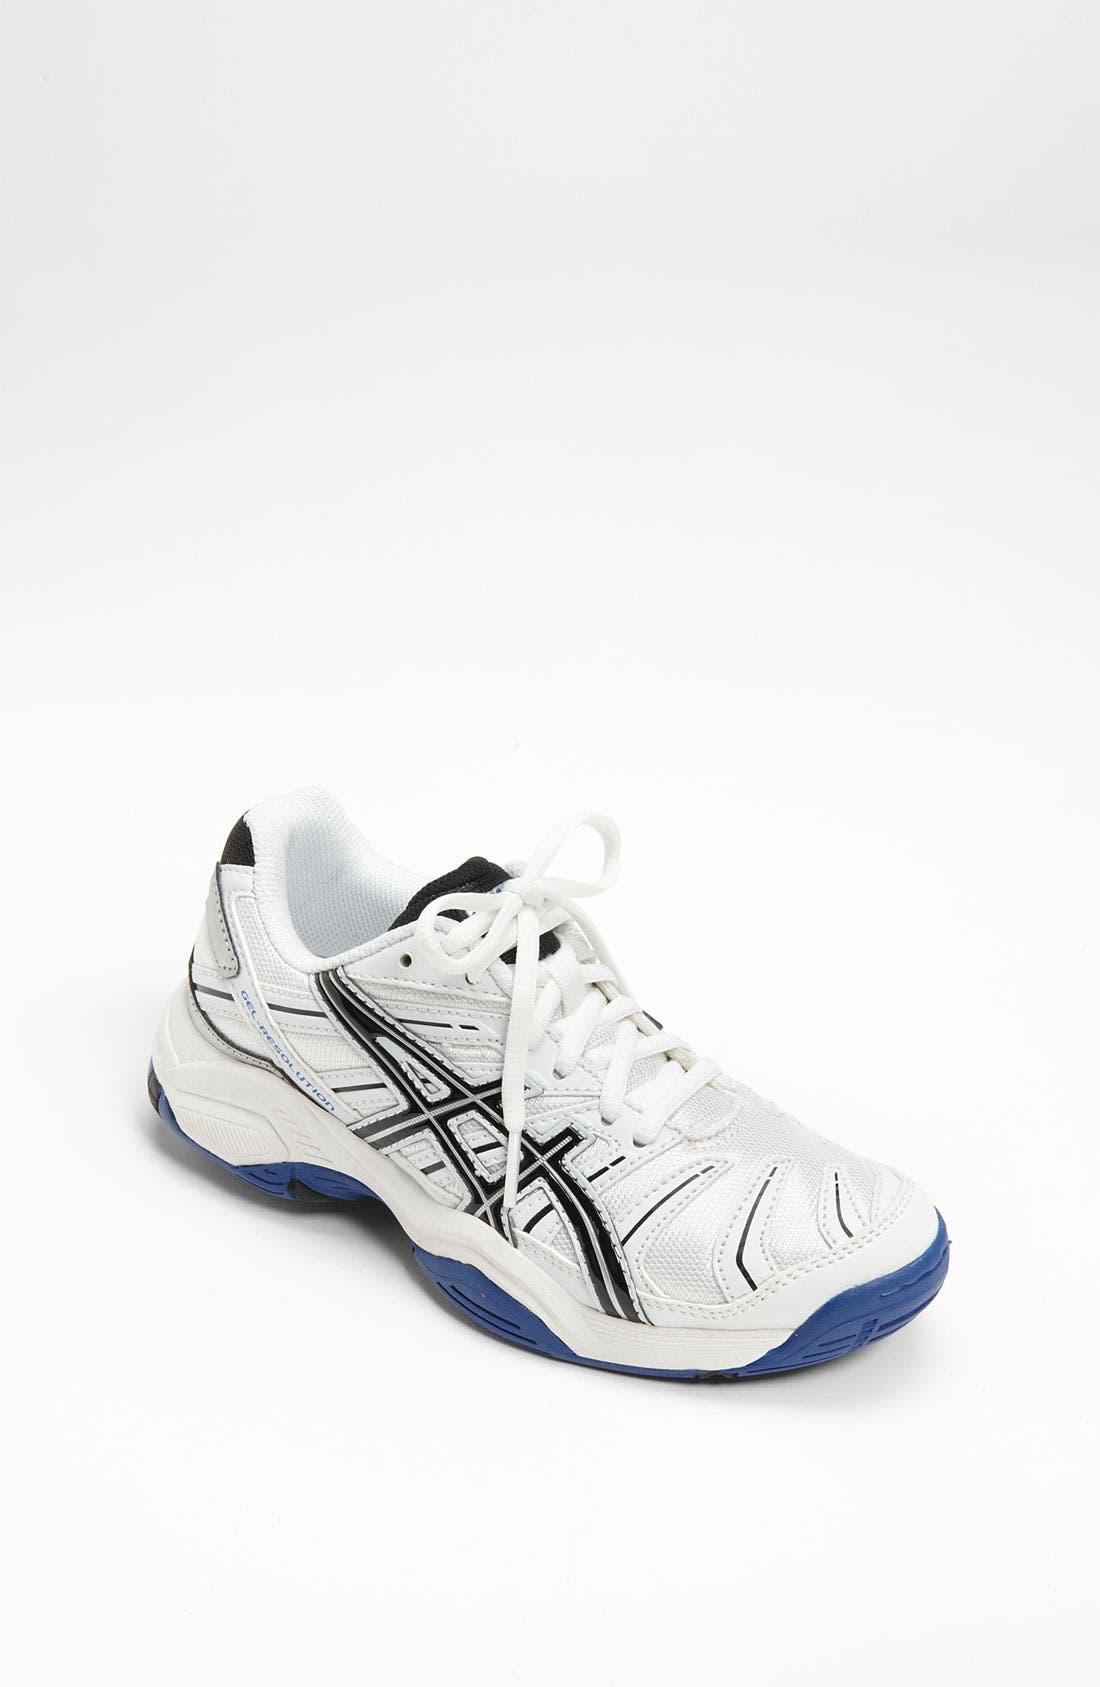 Main Image - ASICS® 'GEL-Resolution' Tennis Shoe (Little Kid & Big Kid)